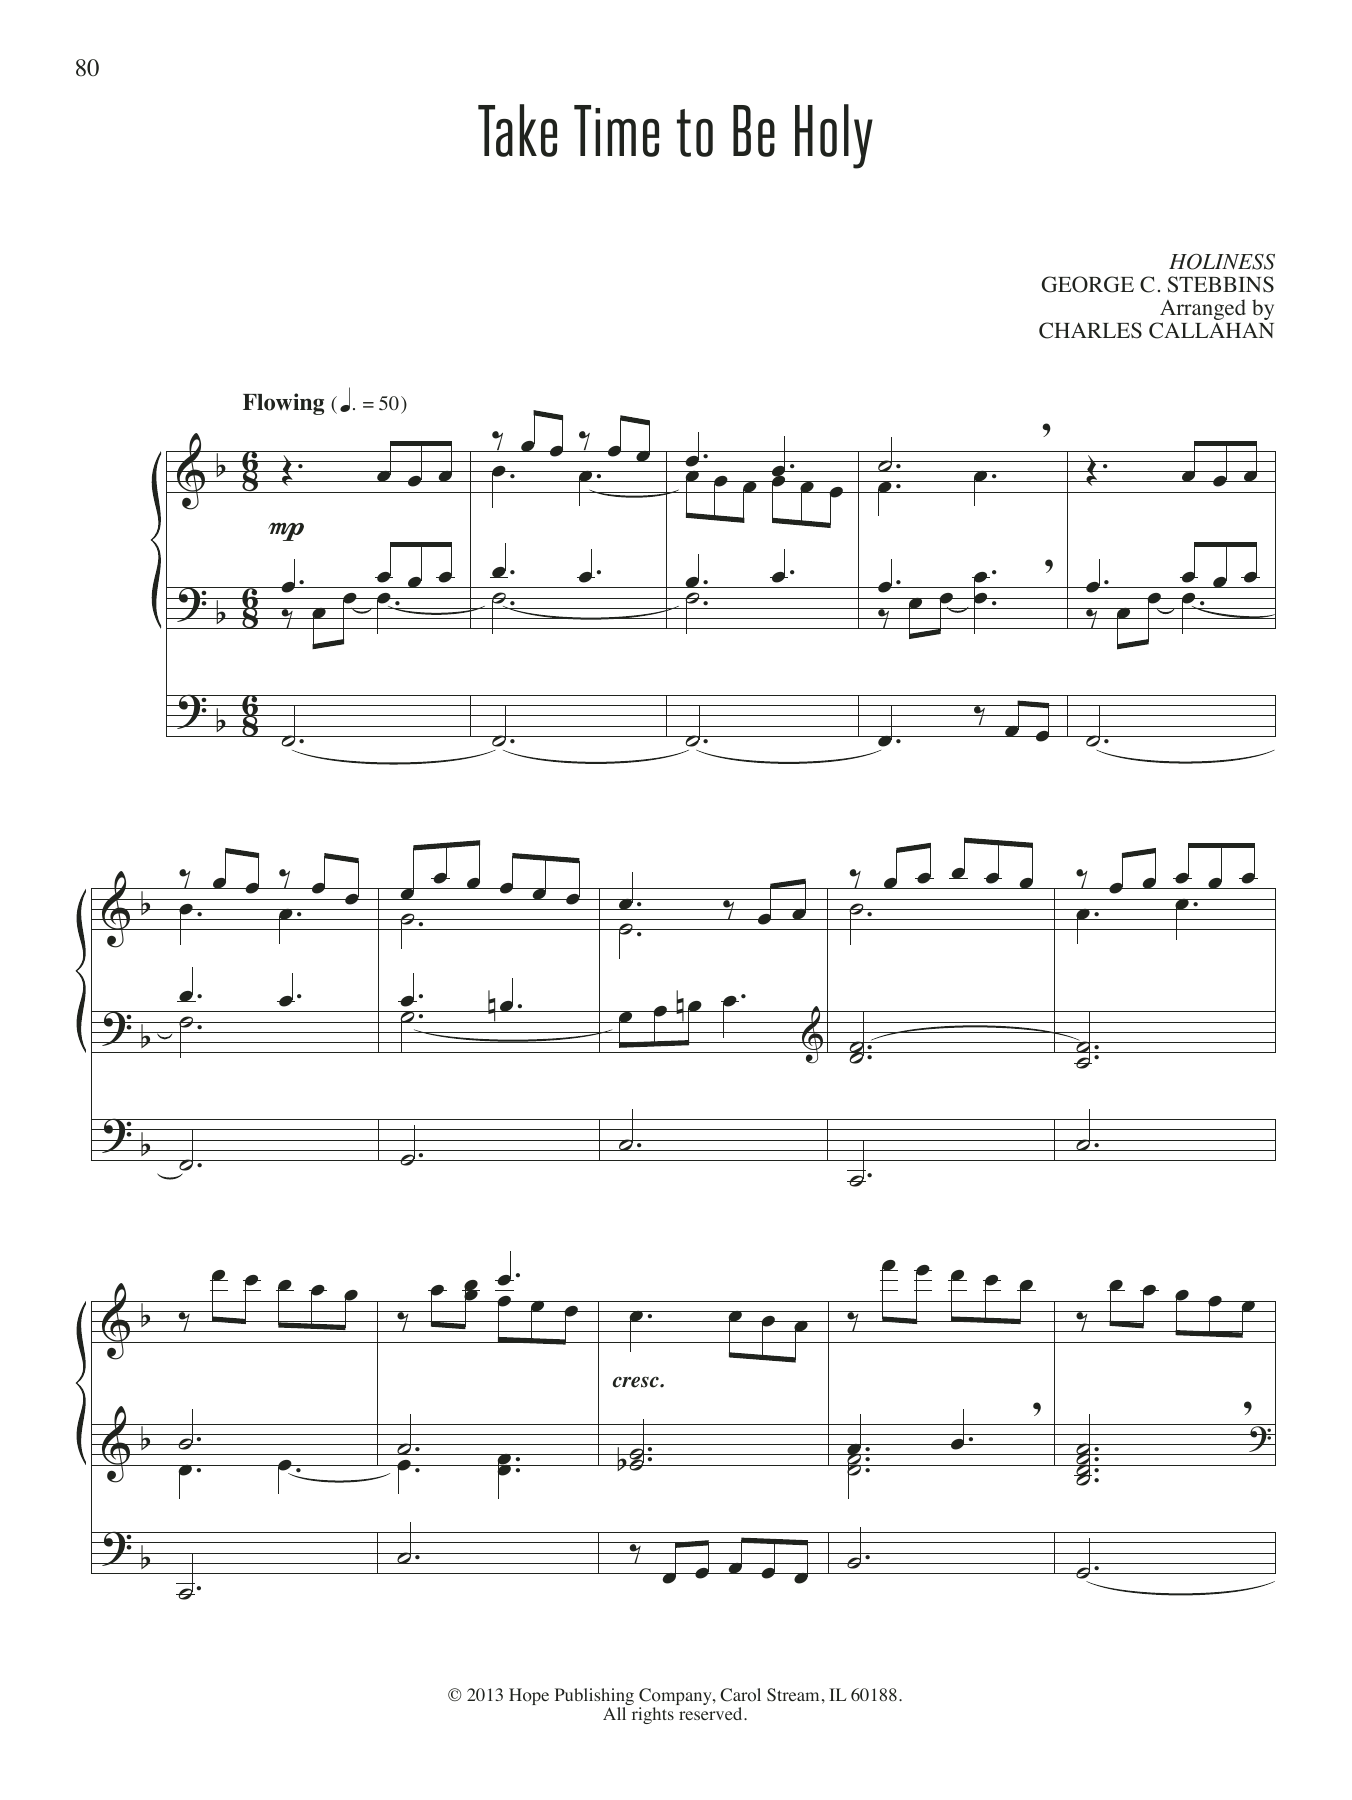 Charles Callahan Take Time To Be Holy sheet music notes and chords. Download Printable PDF.